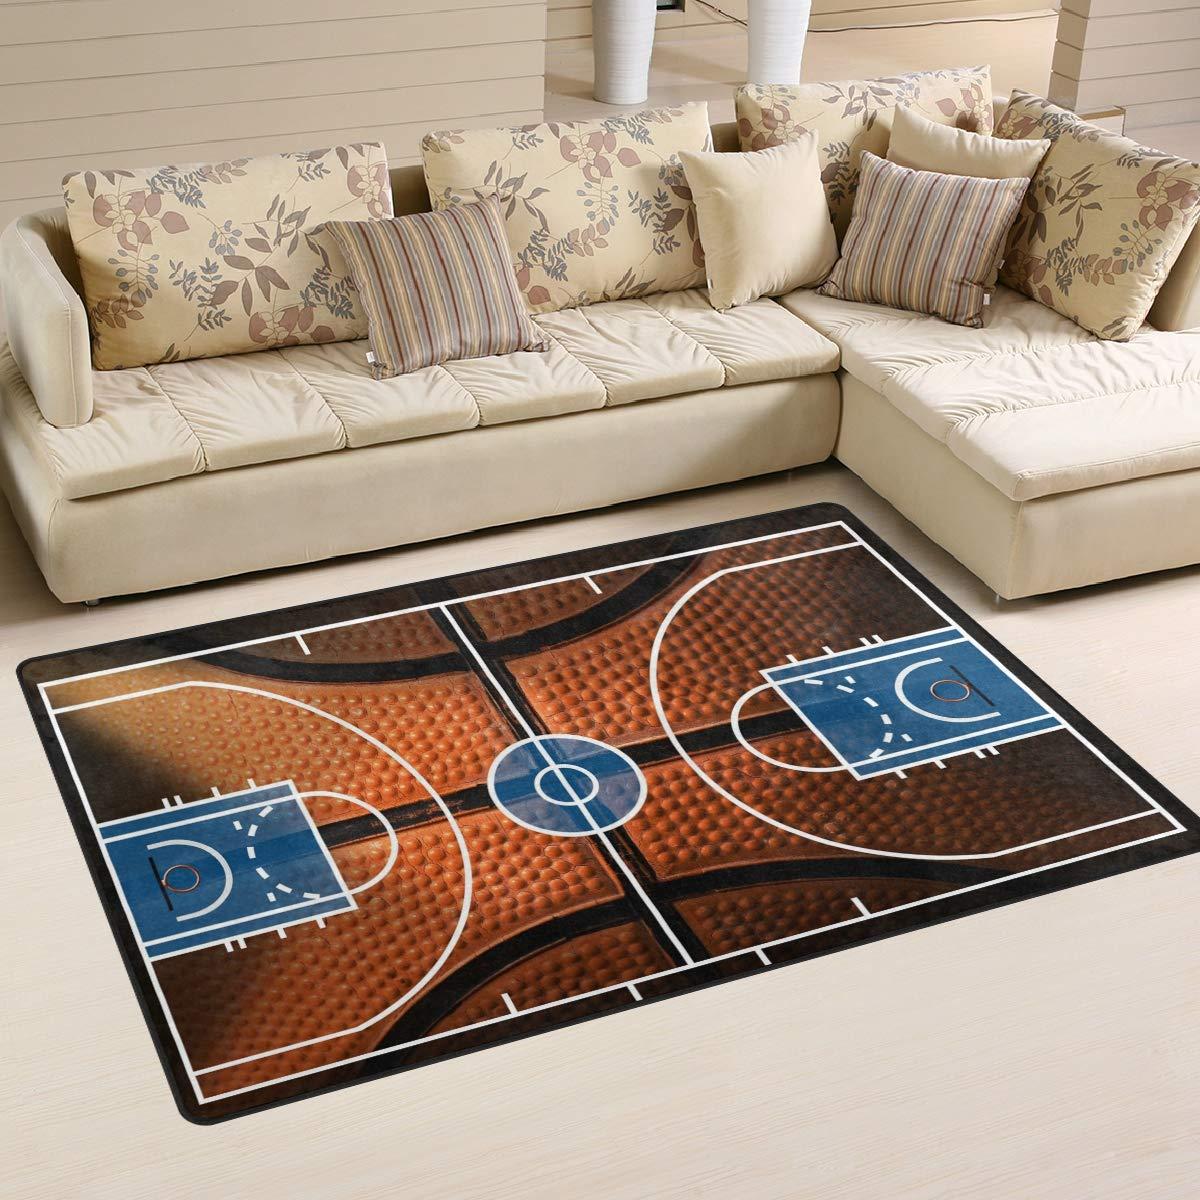 Tela 1.7 x 2.6 ft Use7 Alfombra Antideslizante de Baloncesto para Sala de Estar o Dormitorio Infantil 50 x 80 cm